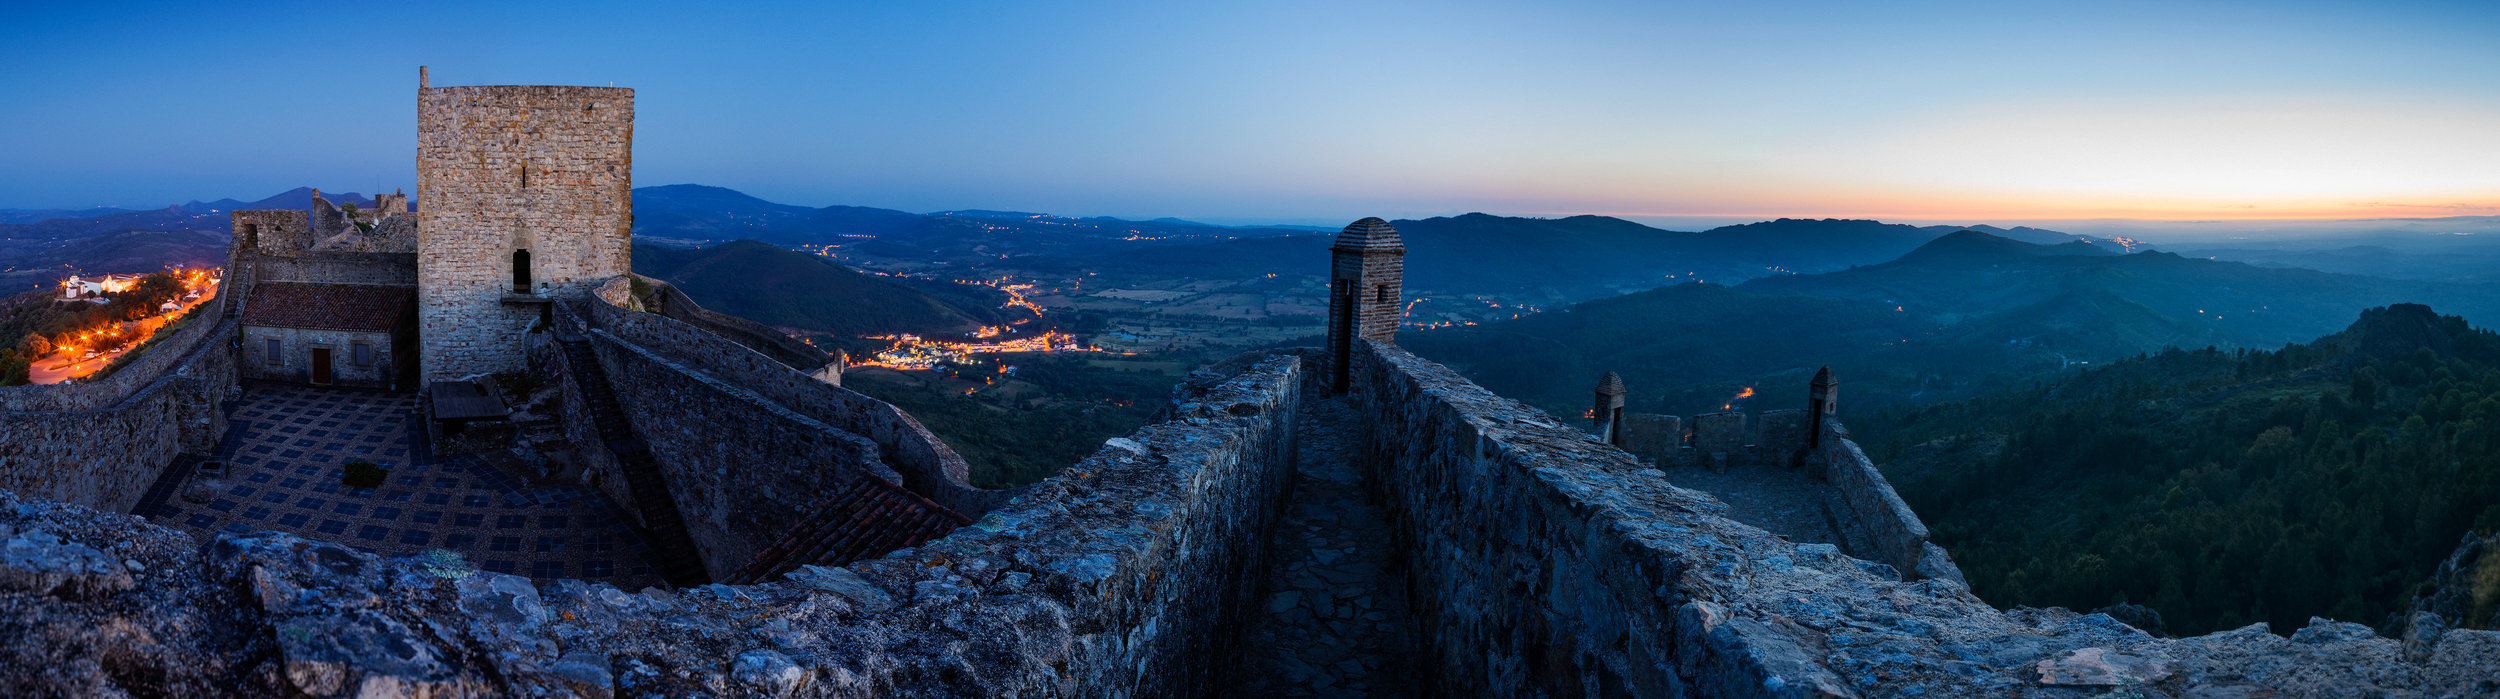 2 Portugal castle B0003249-Pano+copy.jpg